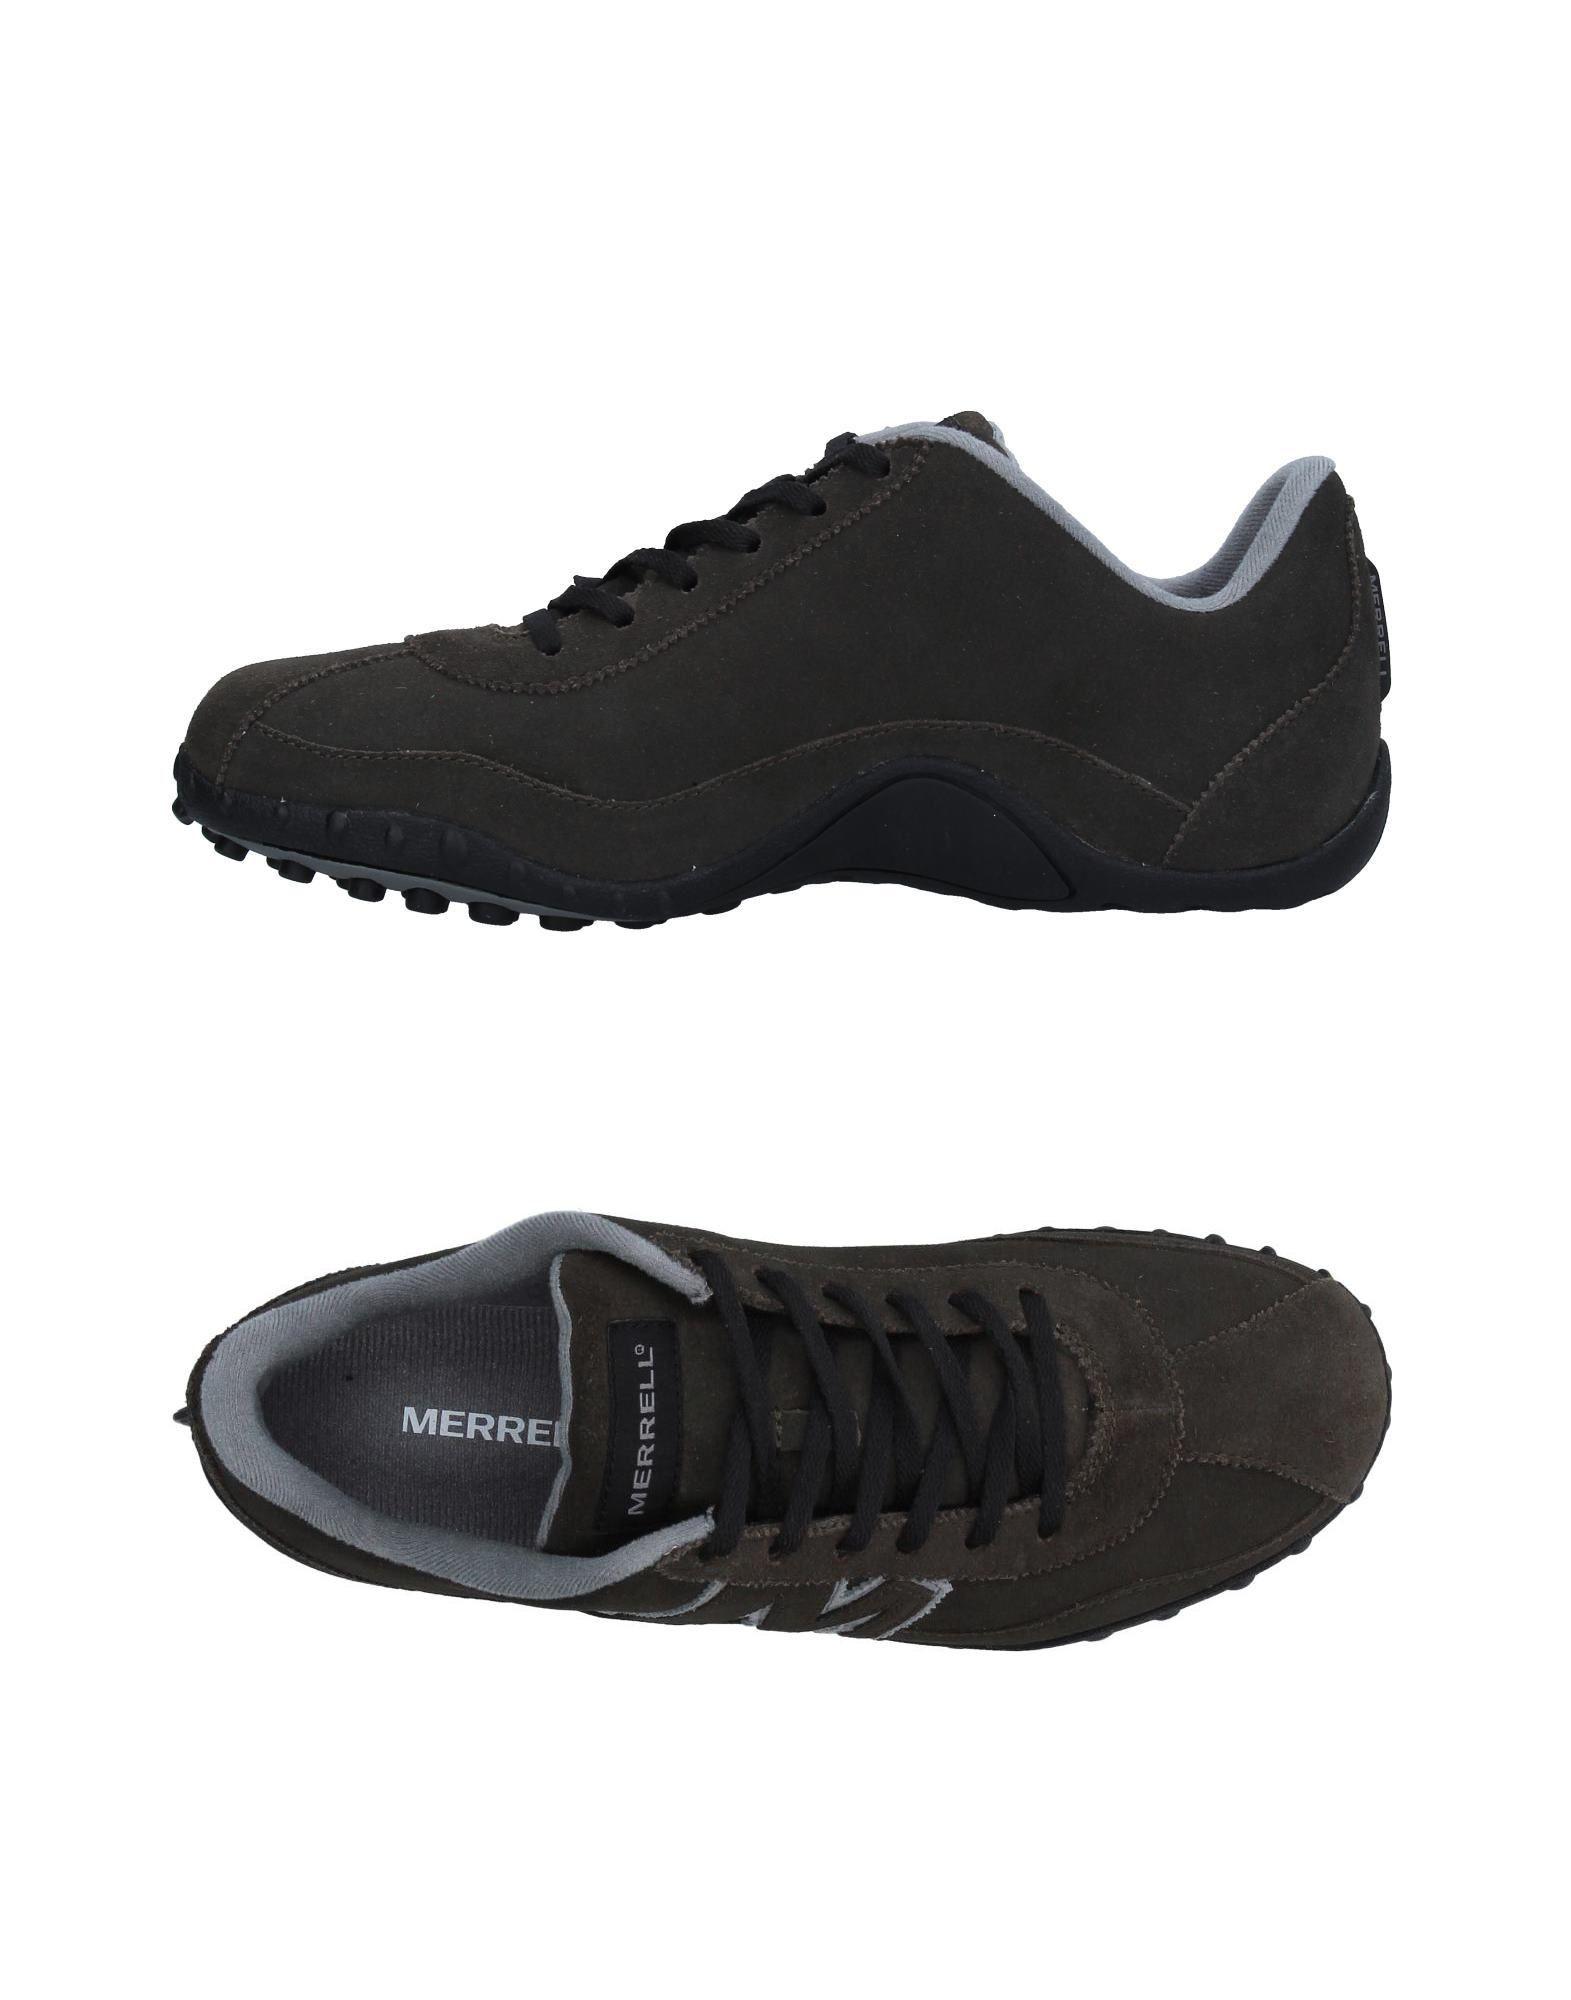 Haltbare Mode billige Schuhe Merrell Sneakers Herren  11227581DV Heiße Schuhe